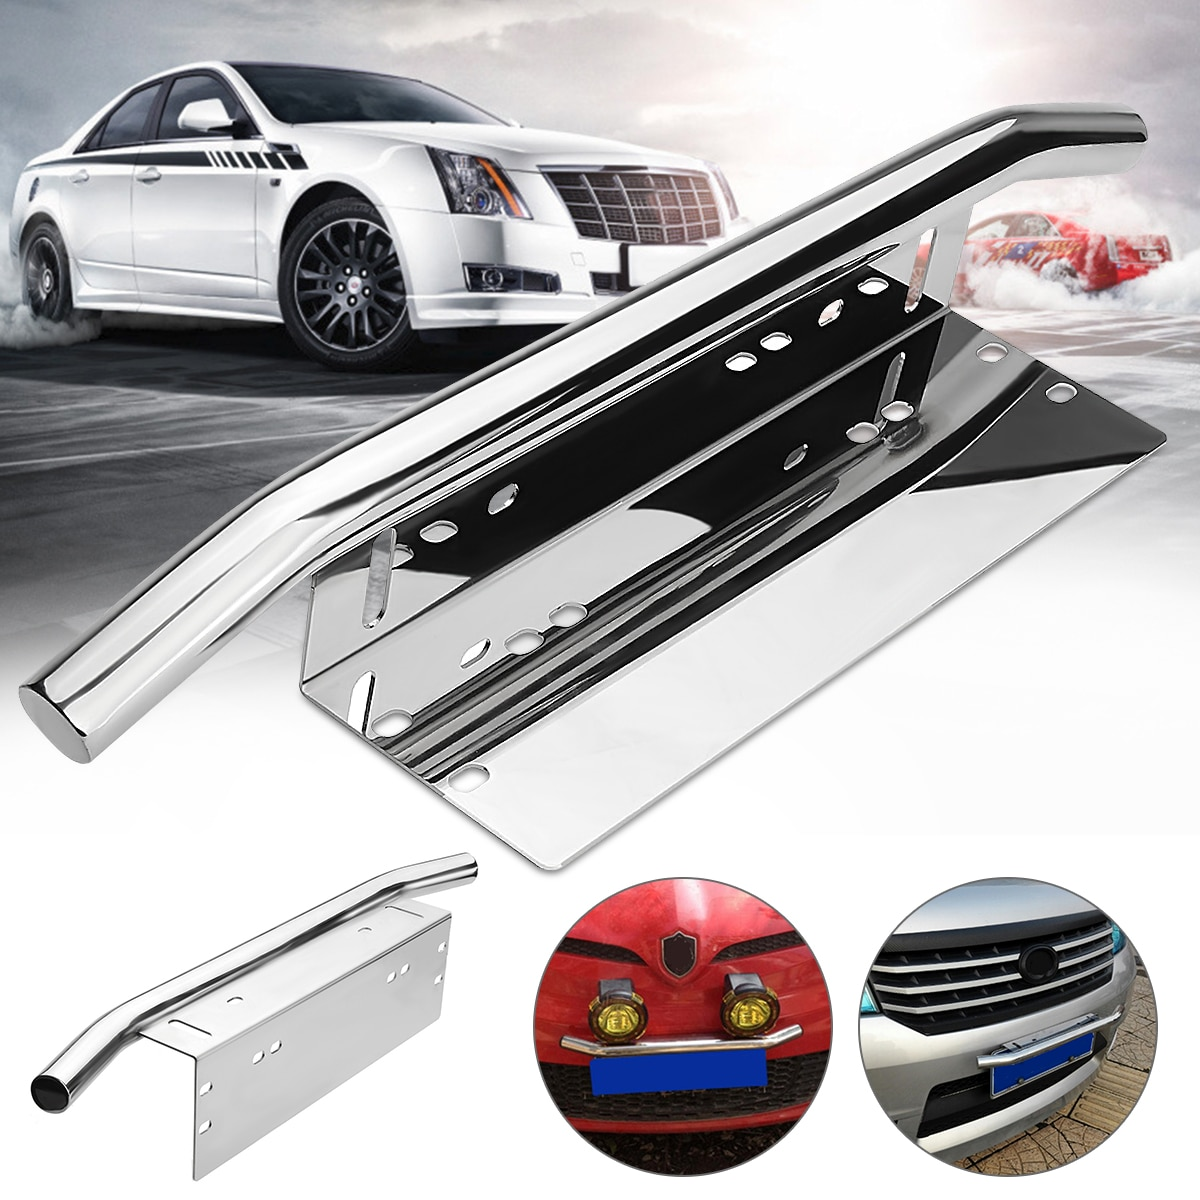 Silver Car Bull Bar Light Mounting Bracket Car License Plate Frame Holder Auto Front License Number Plate Light Bar Mount